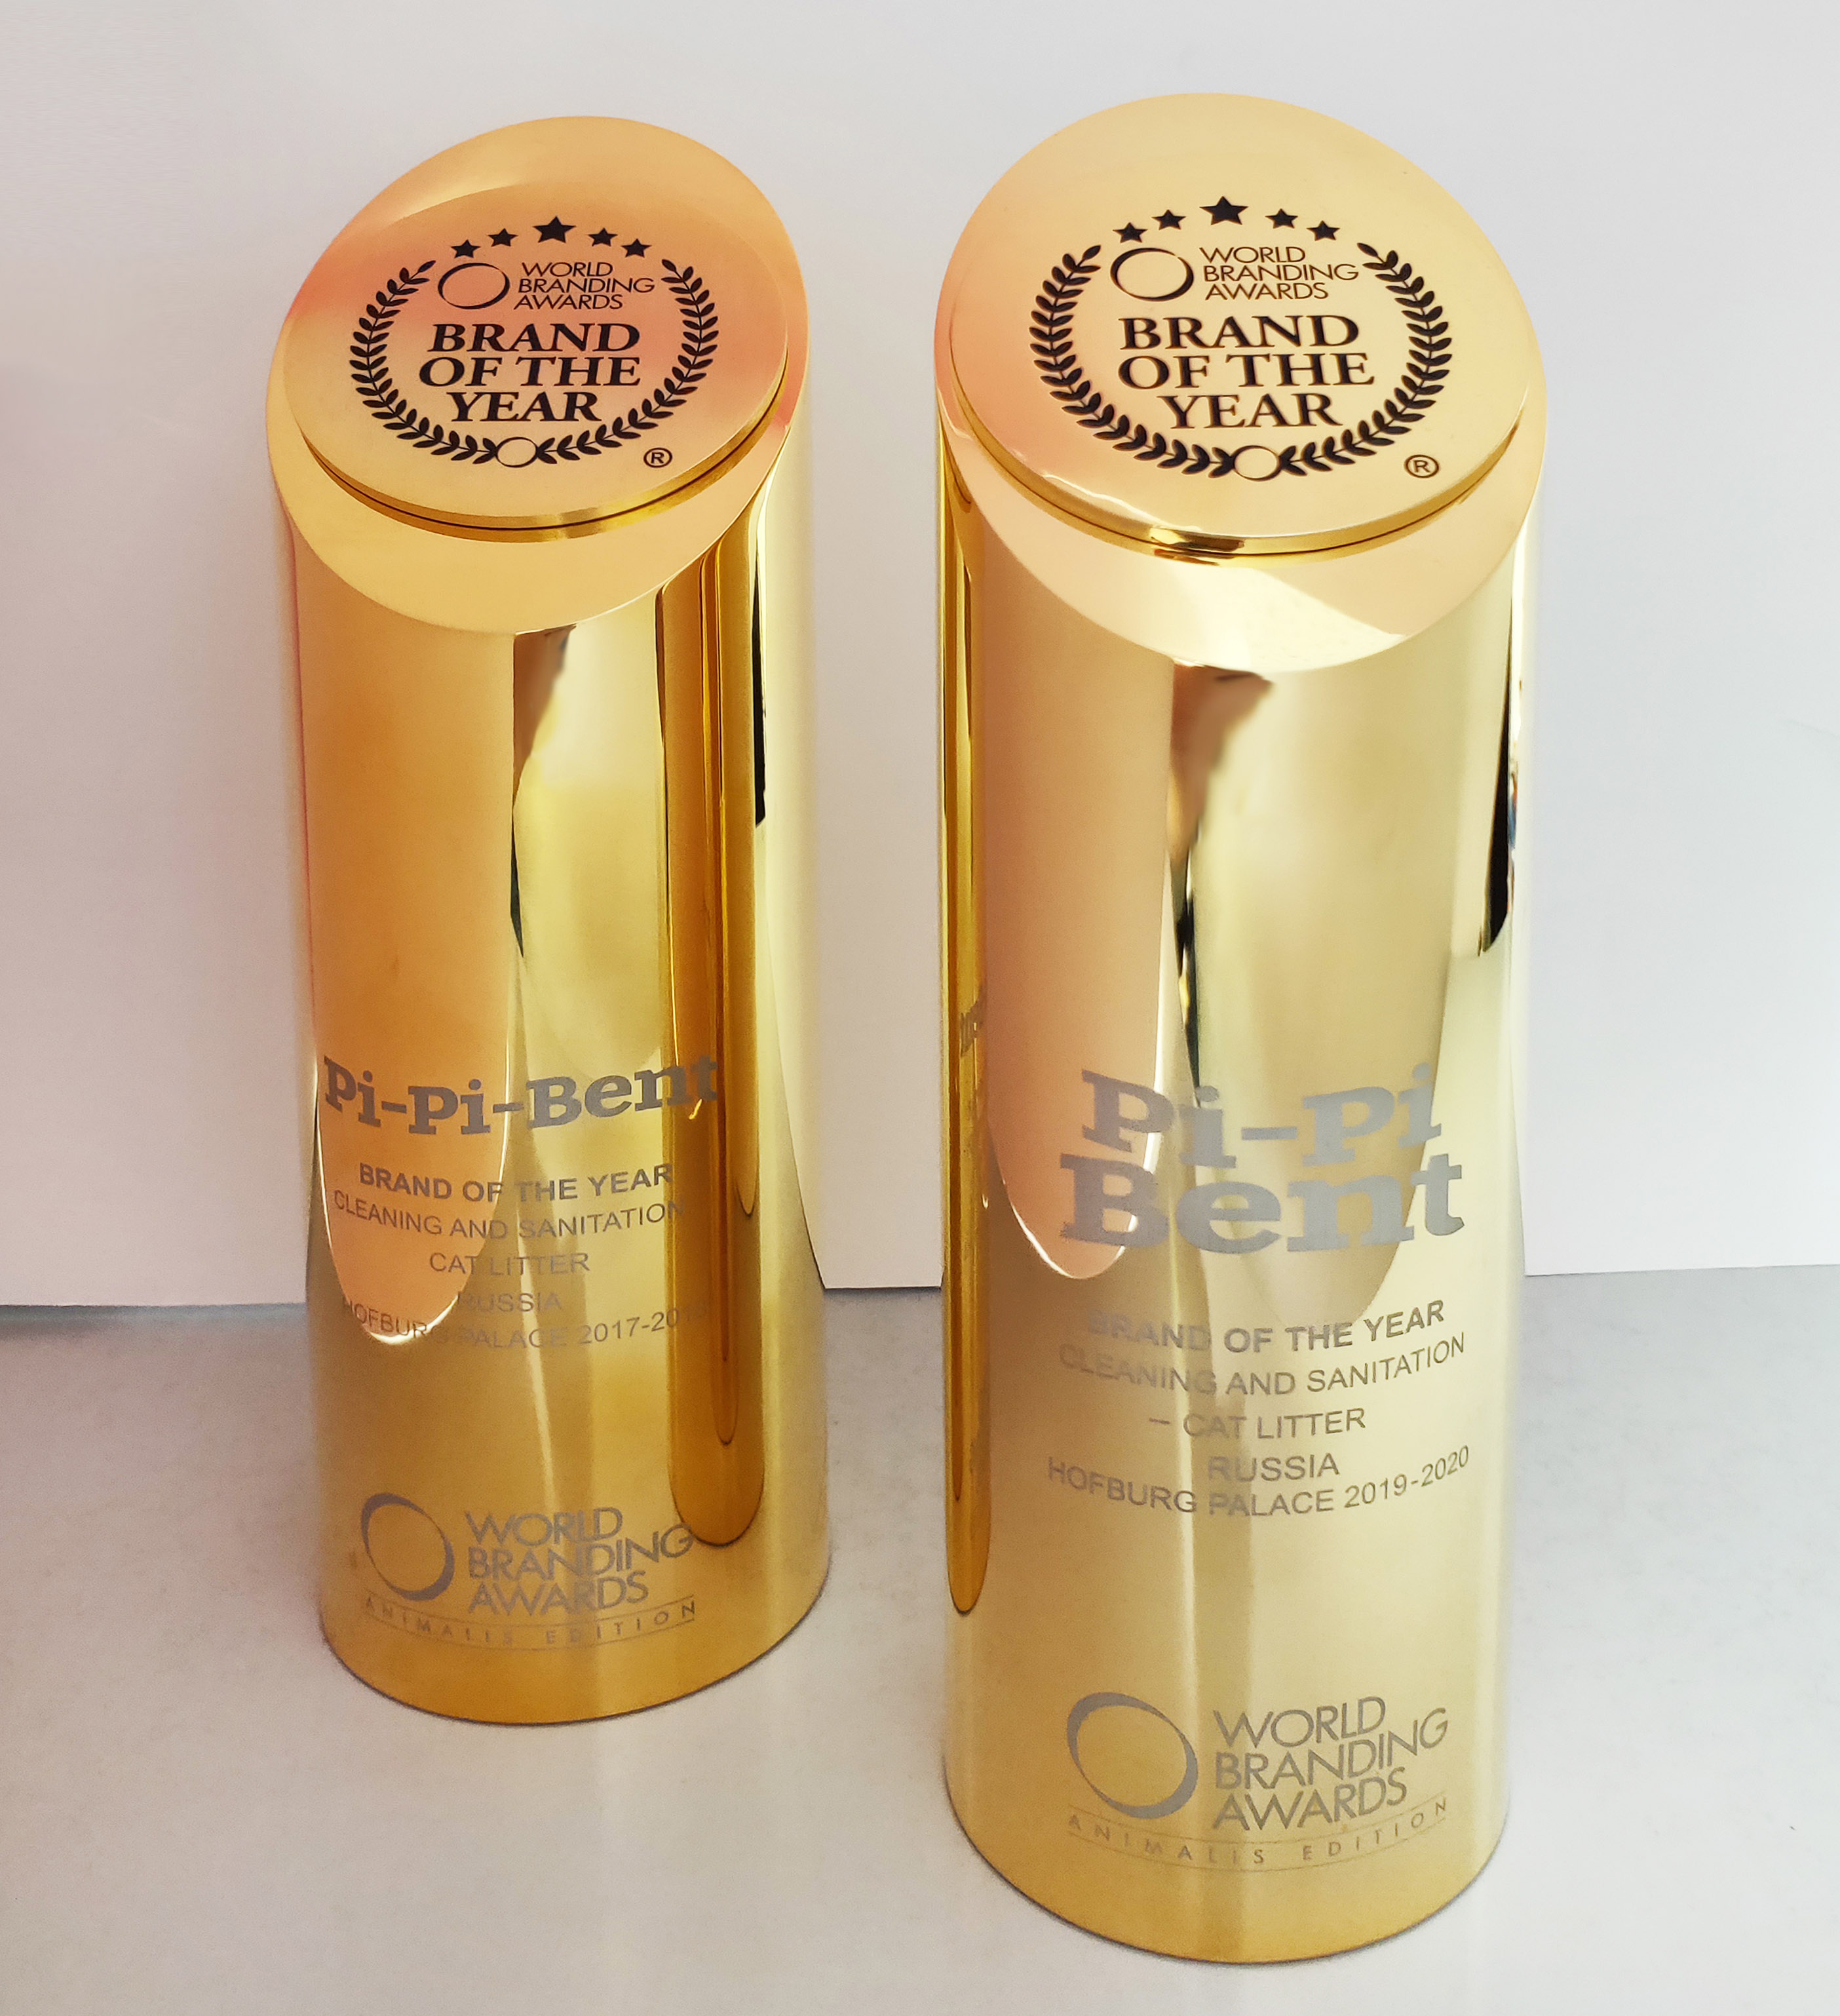 Слева направо: награда за 2017-2018гг., награда за 219-2020гг.